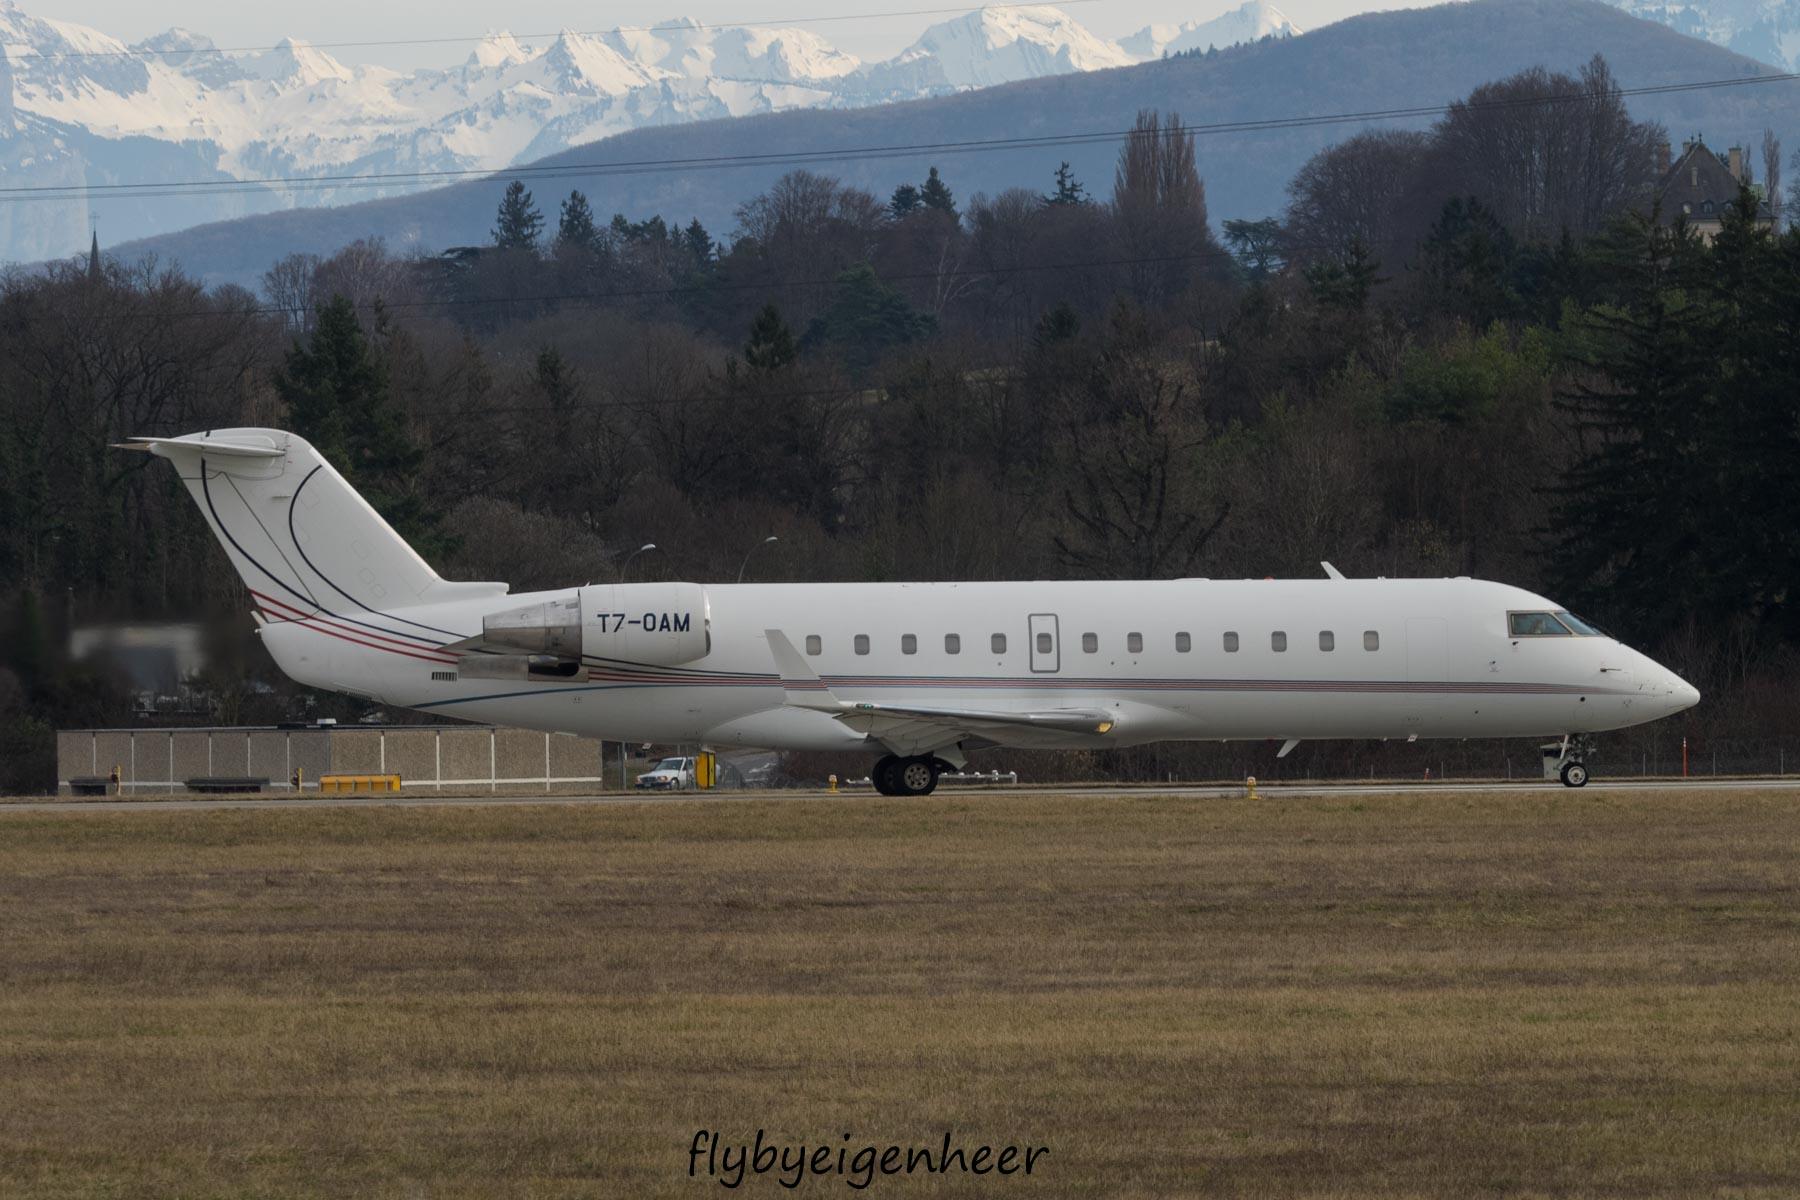 File:T7-OAM Bombardier CL-600-2B19 CRJ-200 CRJ2 -